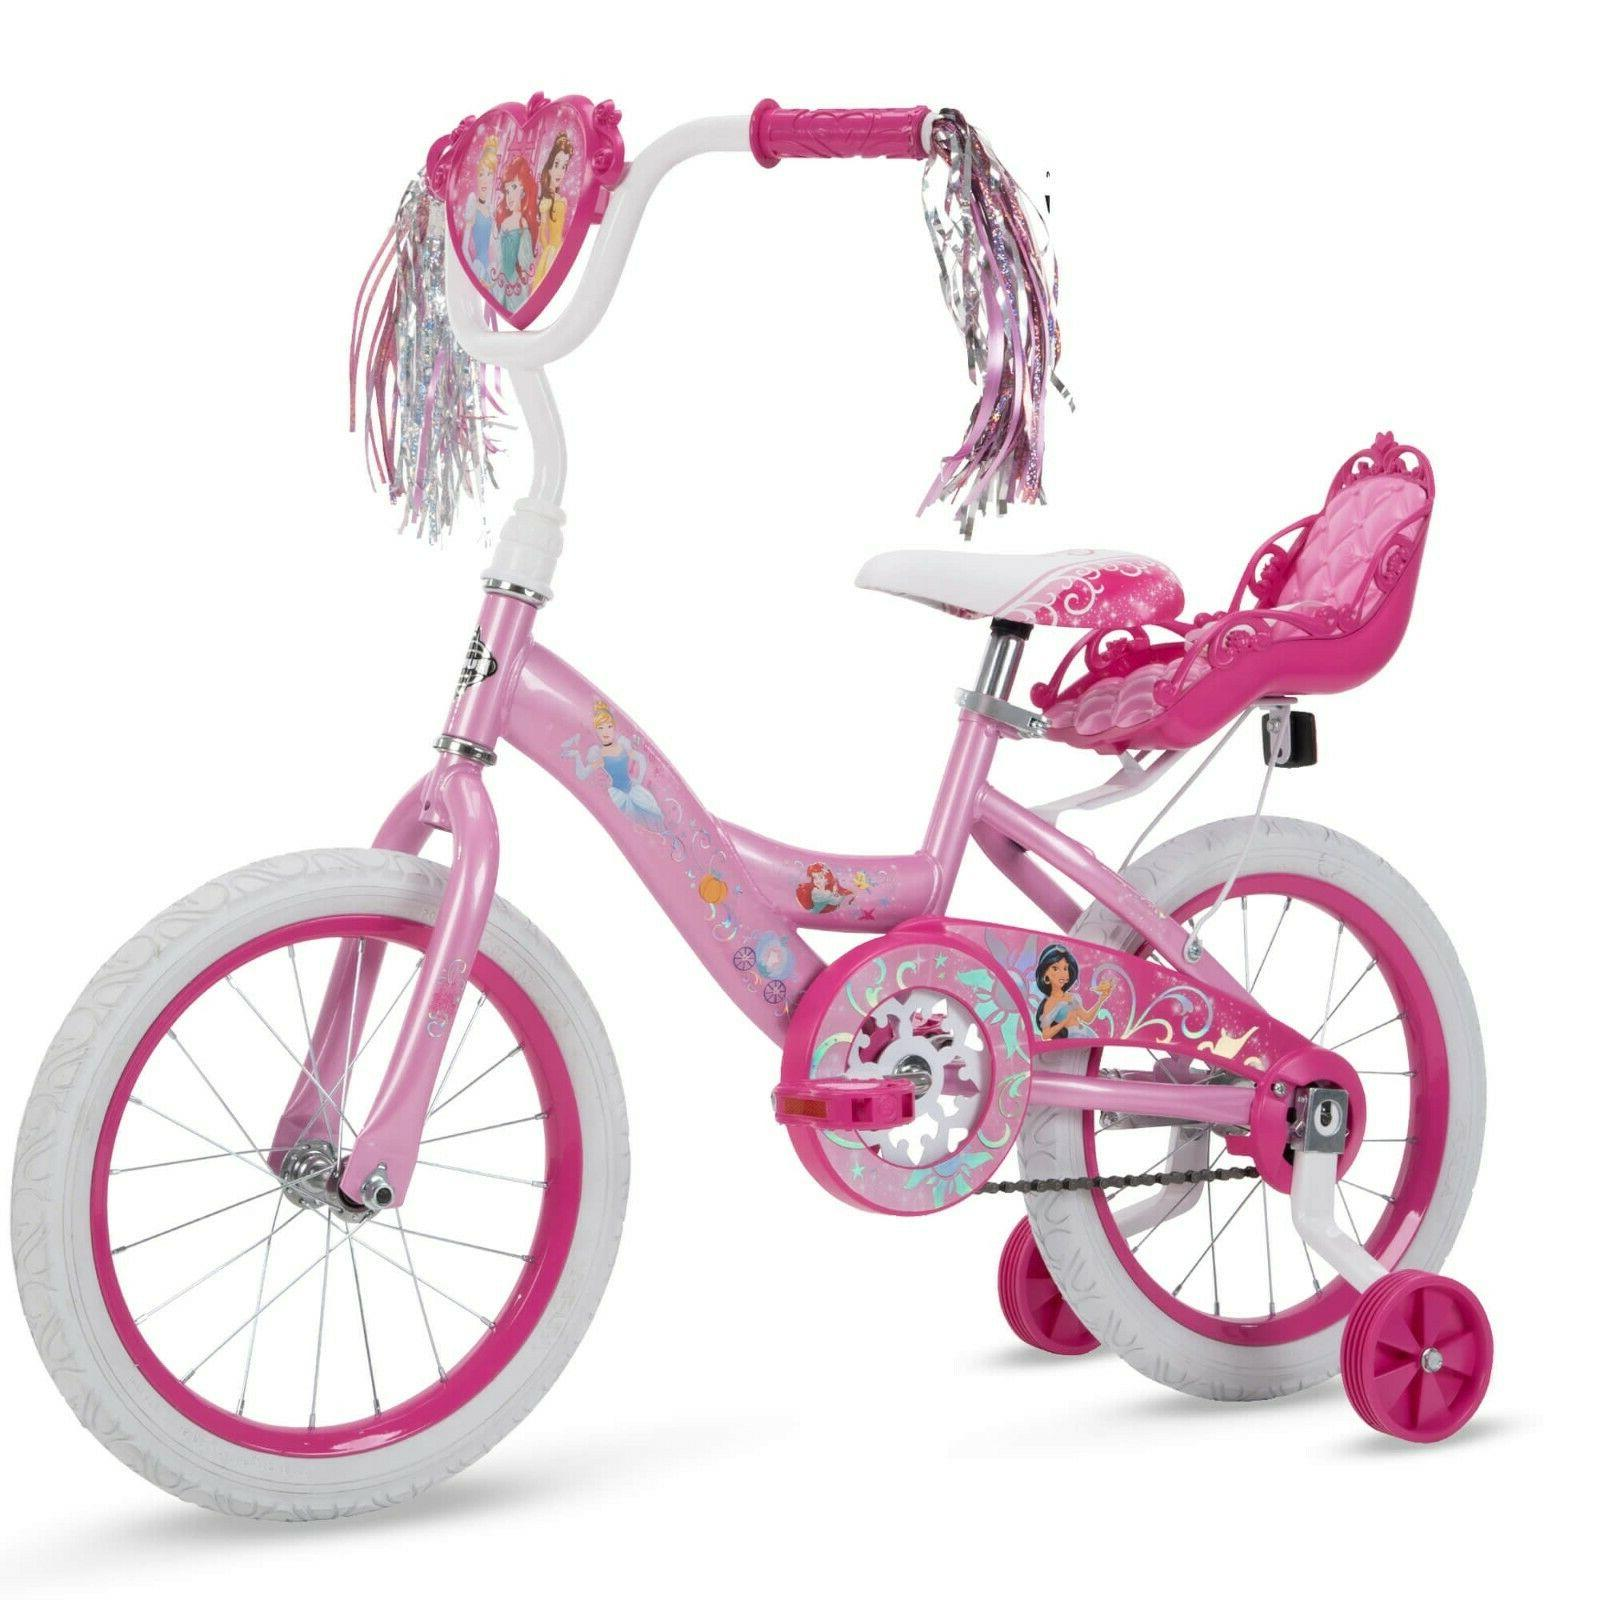 Disney Princess Girls 16-inch Bike Bicycle Kids Outdoor Fun